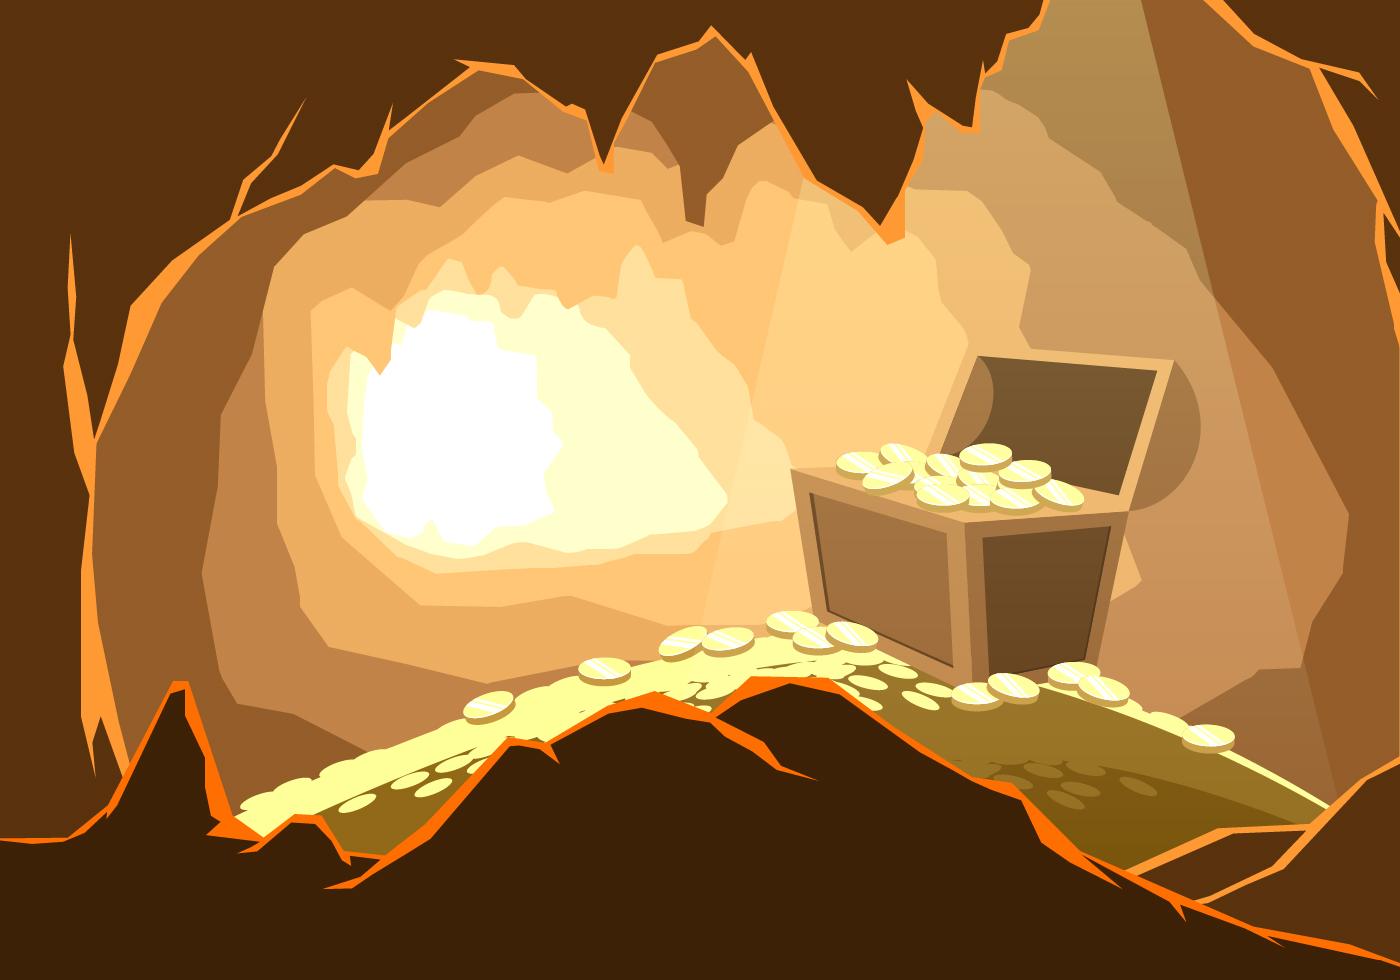 Treasure In The Cavern Free Vector Download Free Vectors